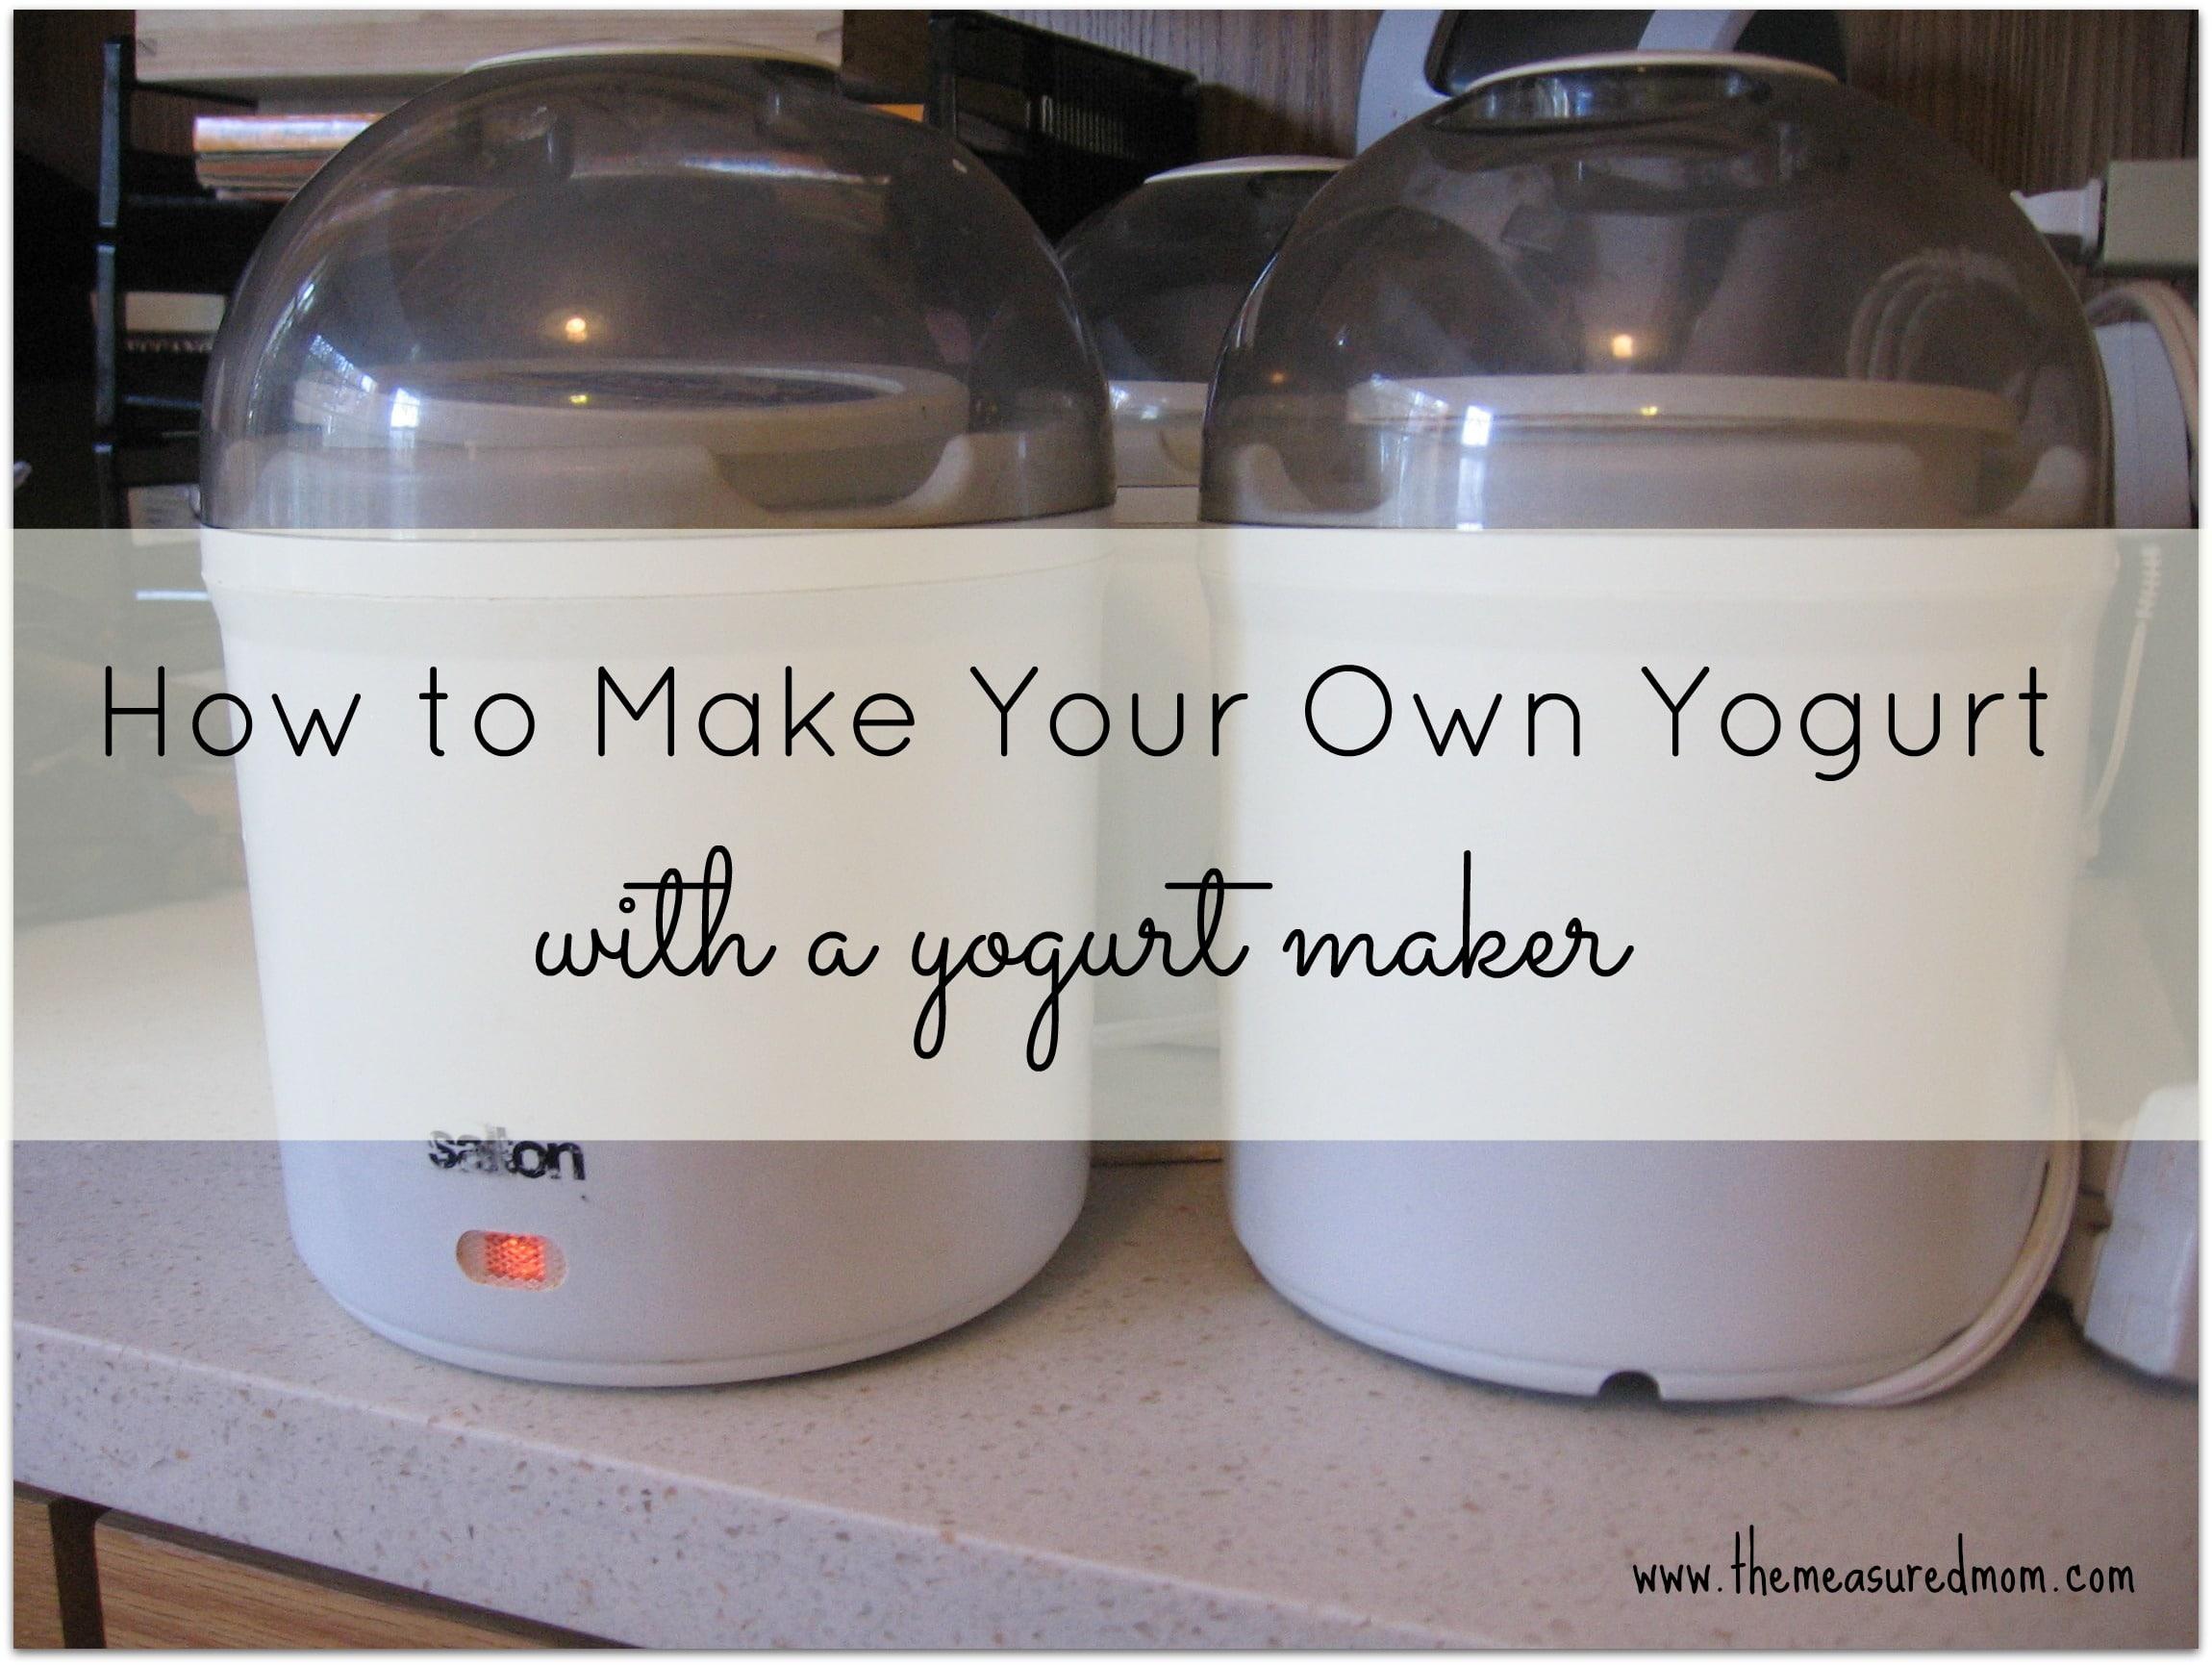 How To Make Homemade Yogurt With A Yogurt Maker The Measured Mom,Sobieski Premium Vodka